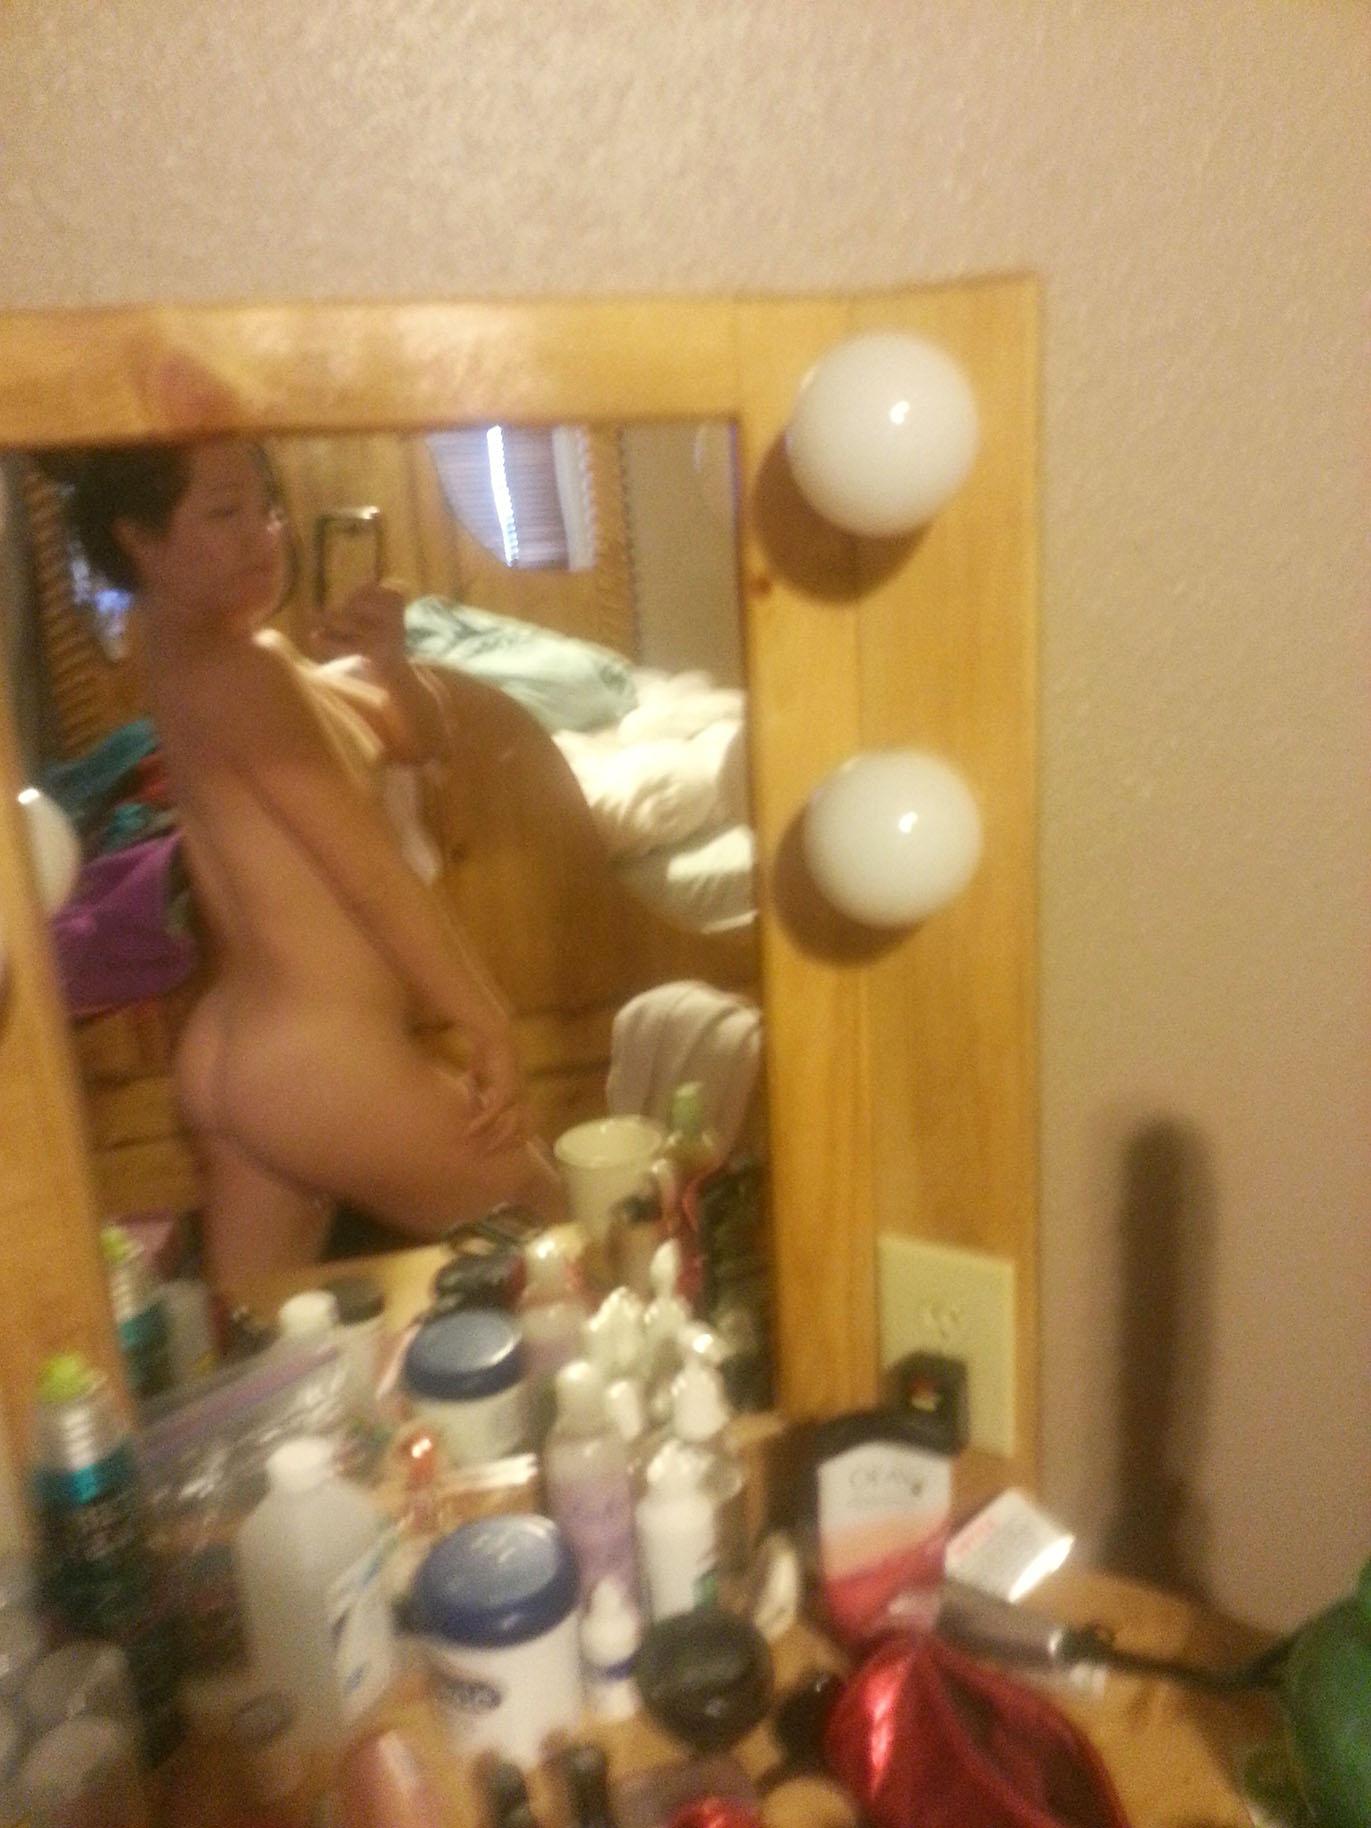 UFC Angela Magaña Leaked Photos, Nude Selfies